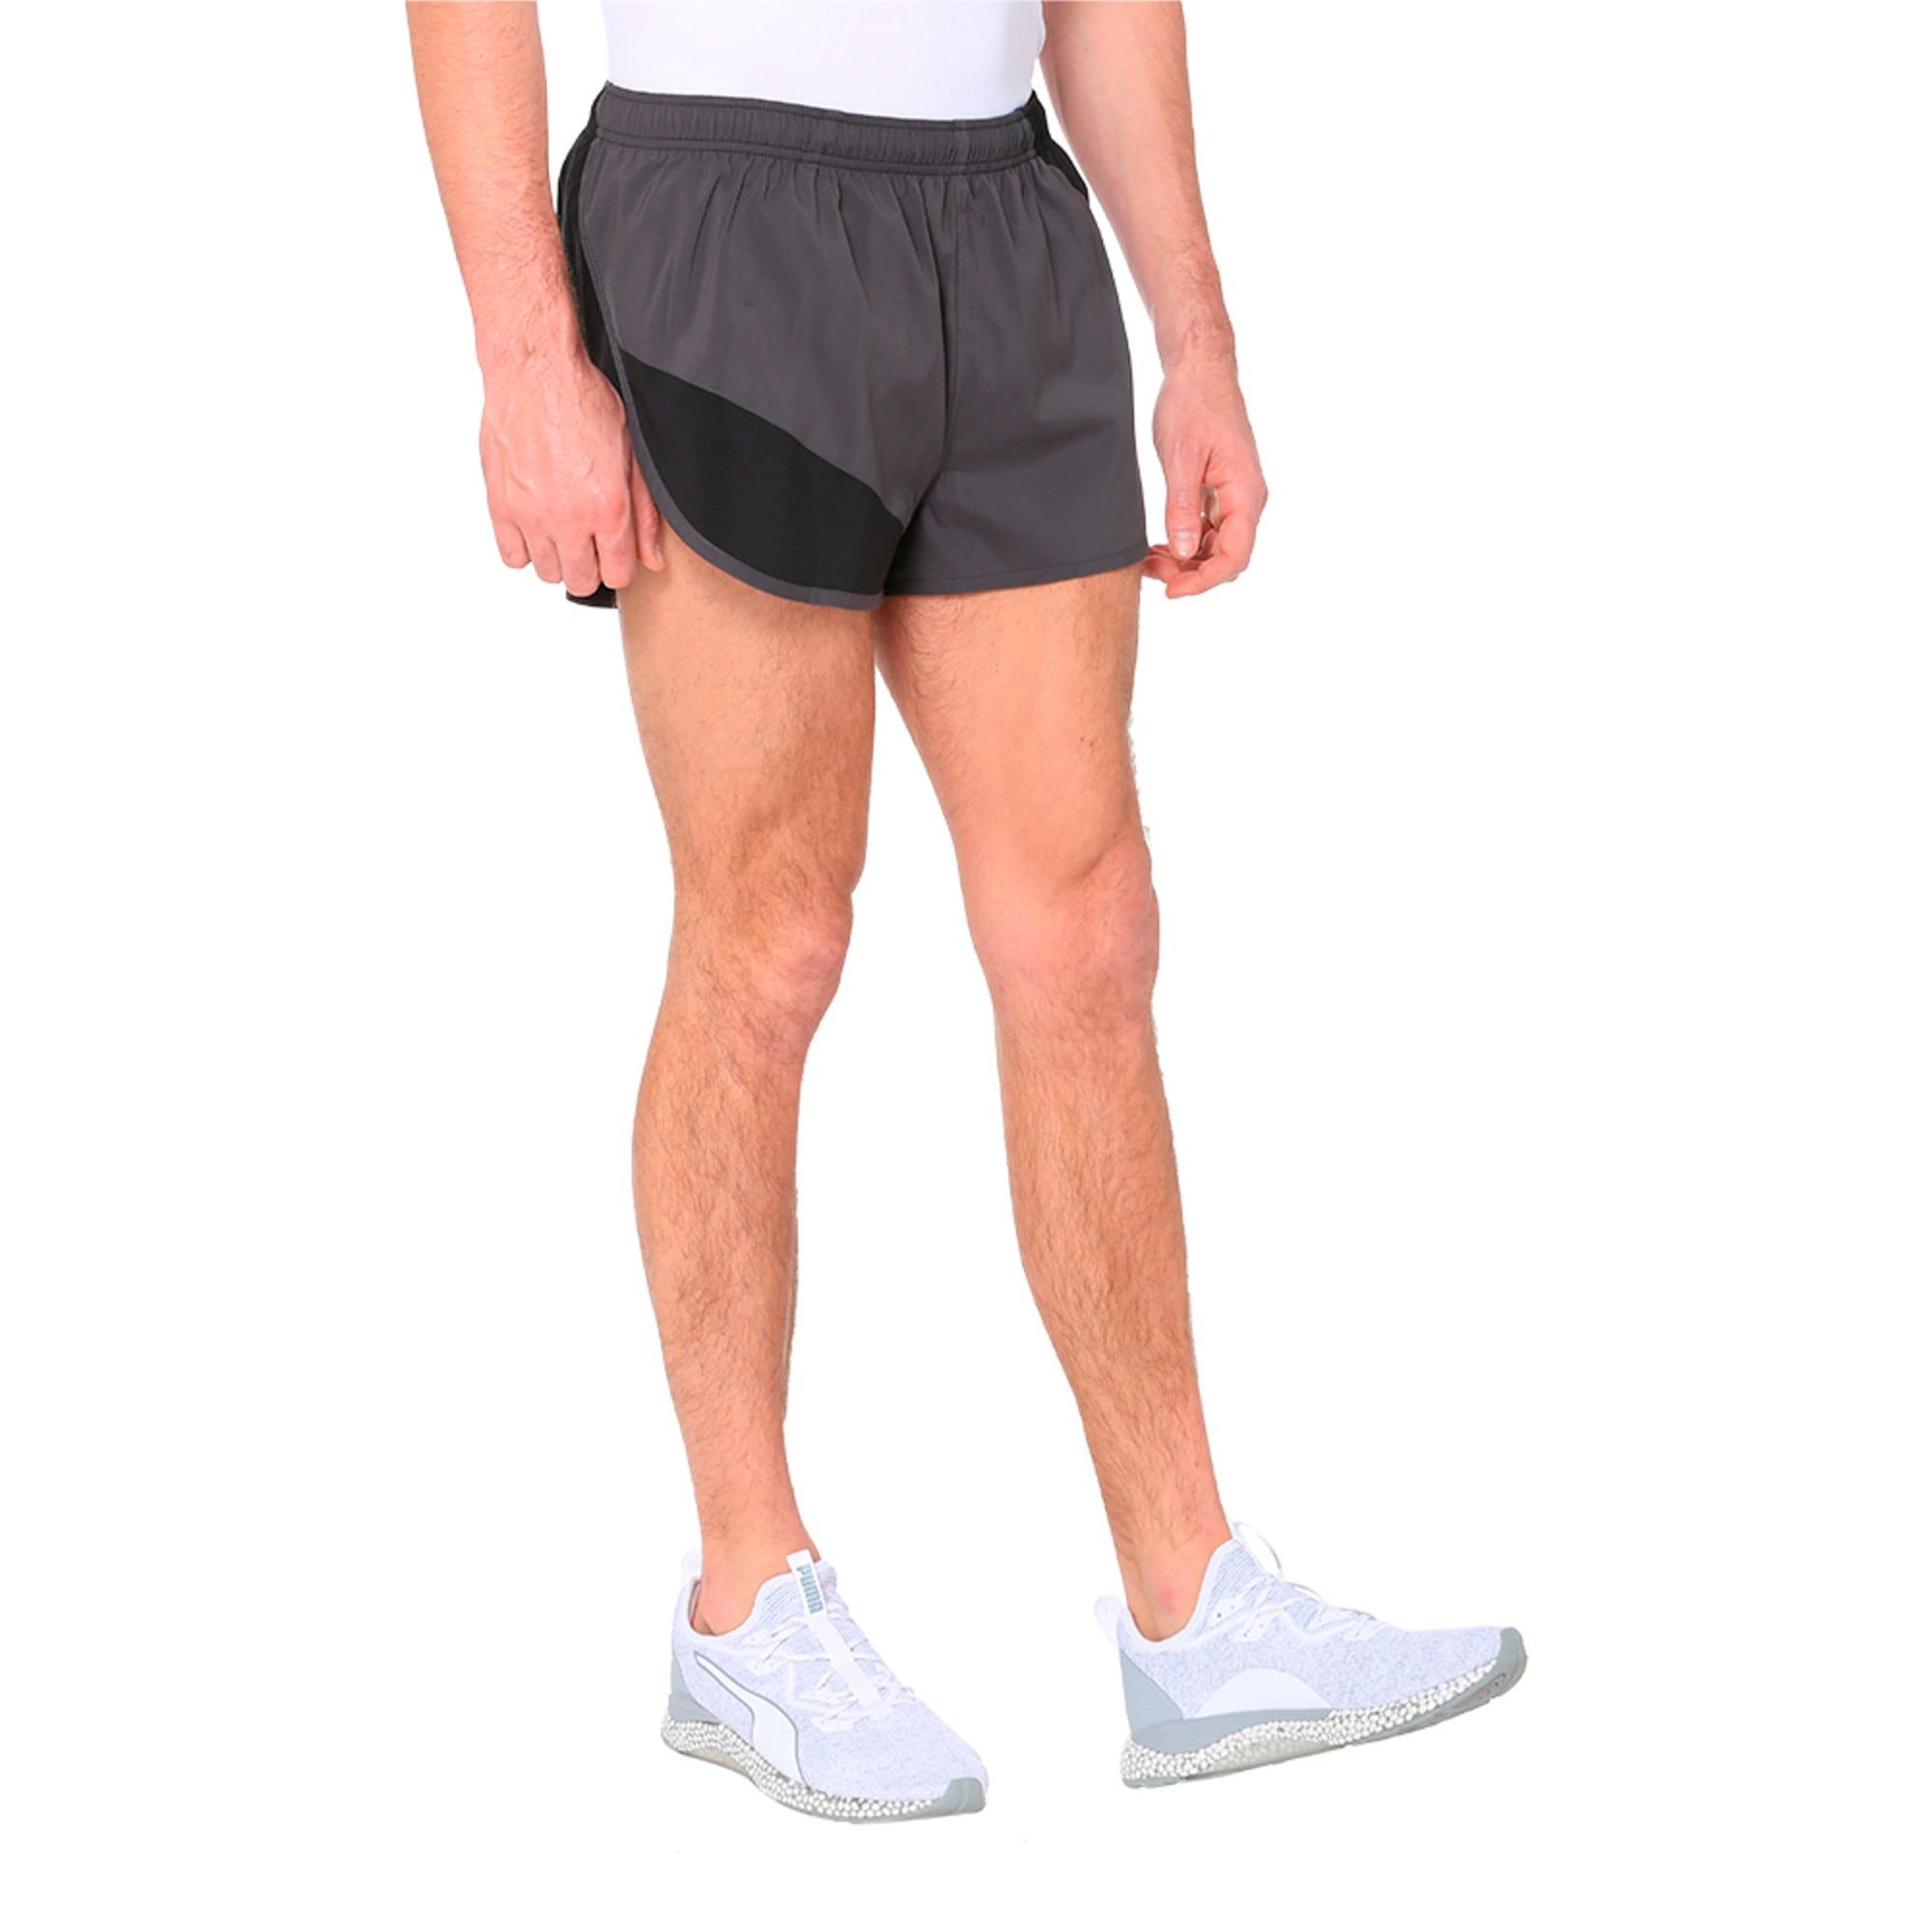 Thumbnail 5 of IGNITE Men's Running Split Shorts, Puma Black-Asphalt, medium-IND